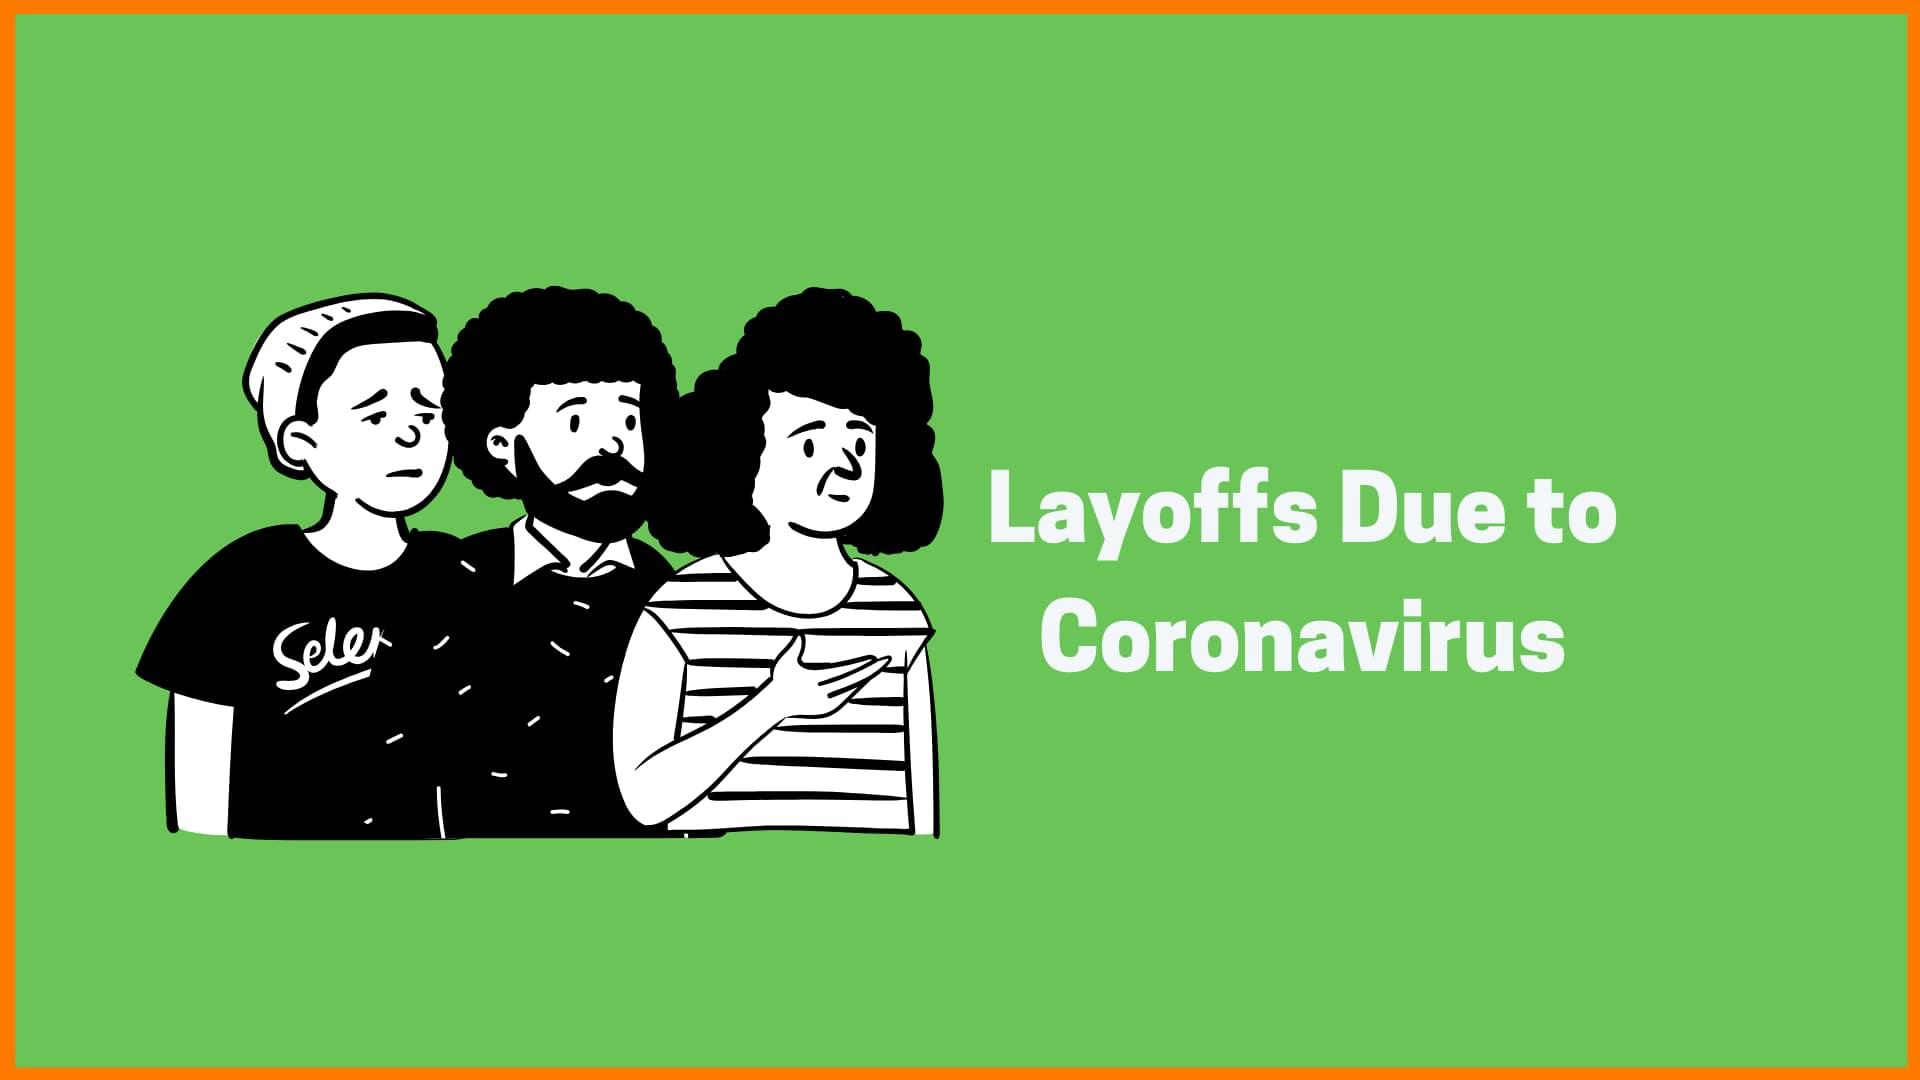 [Infographic] Case Study on Layoffs Due to Coronavirus